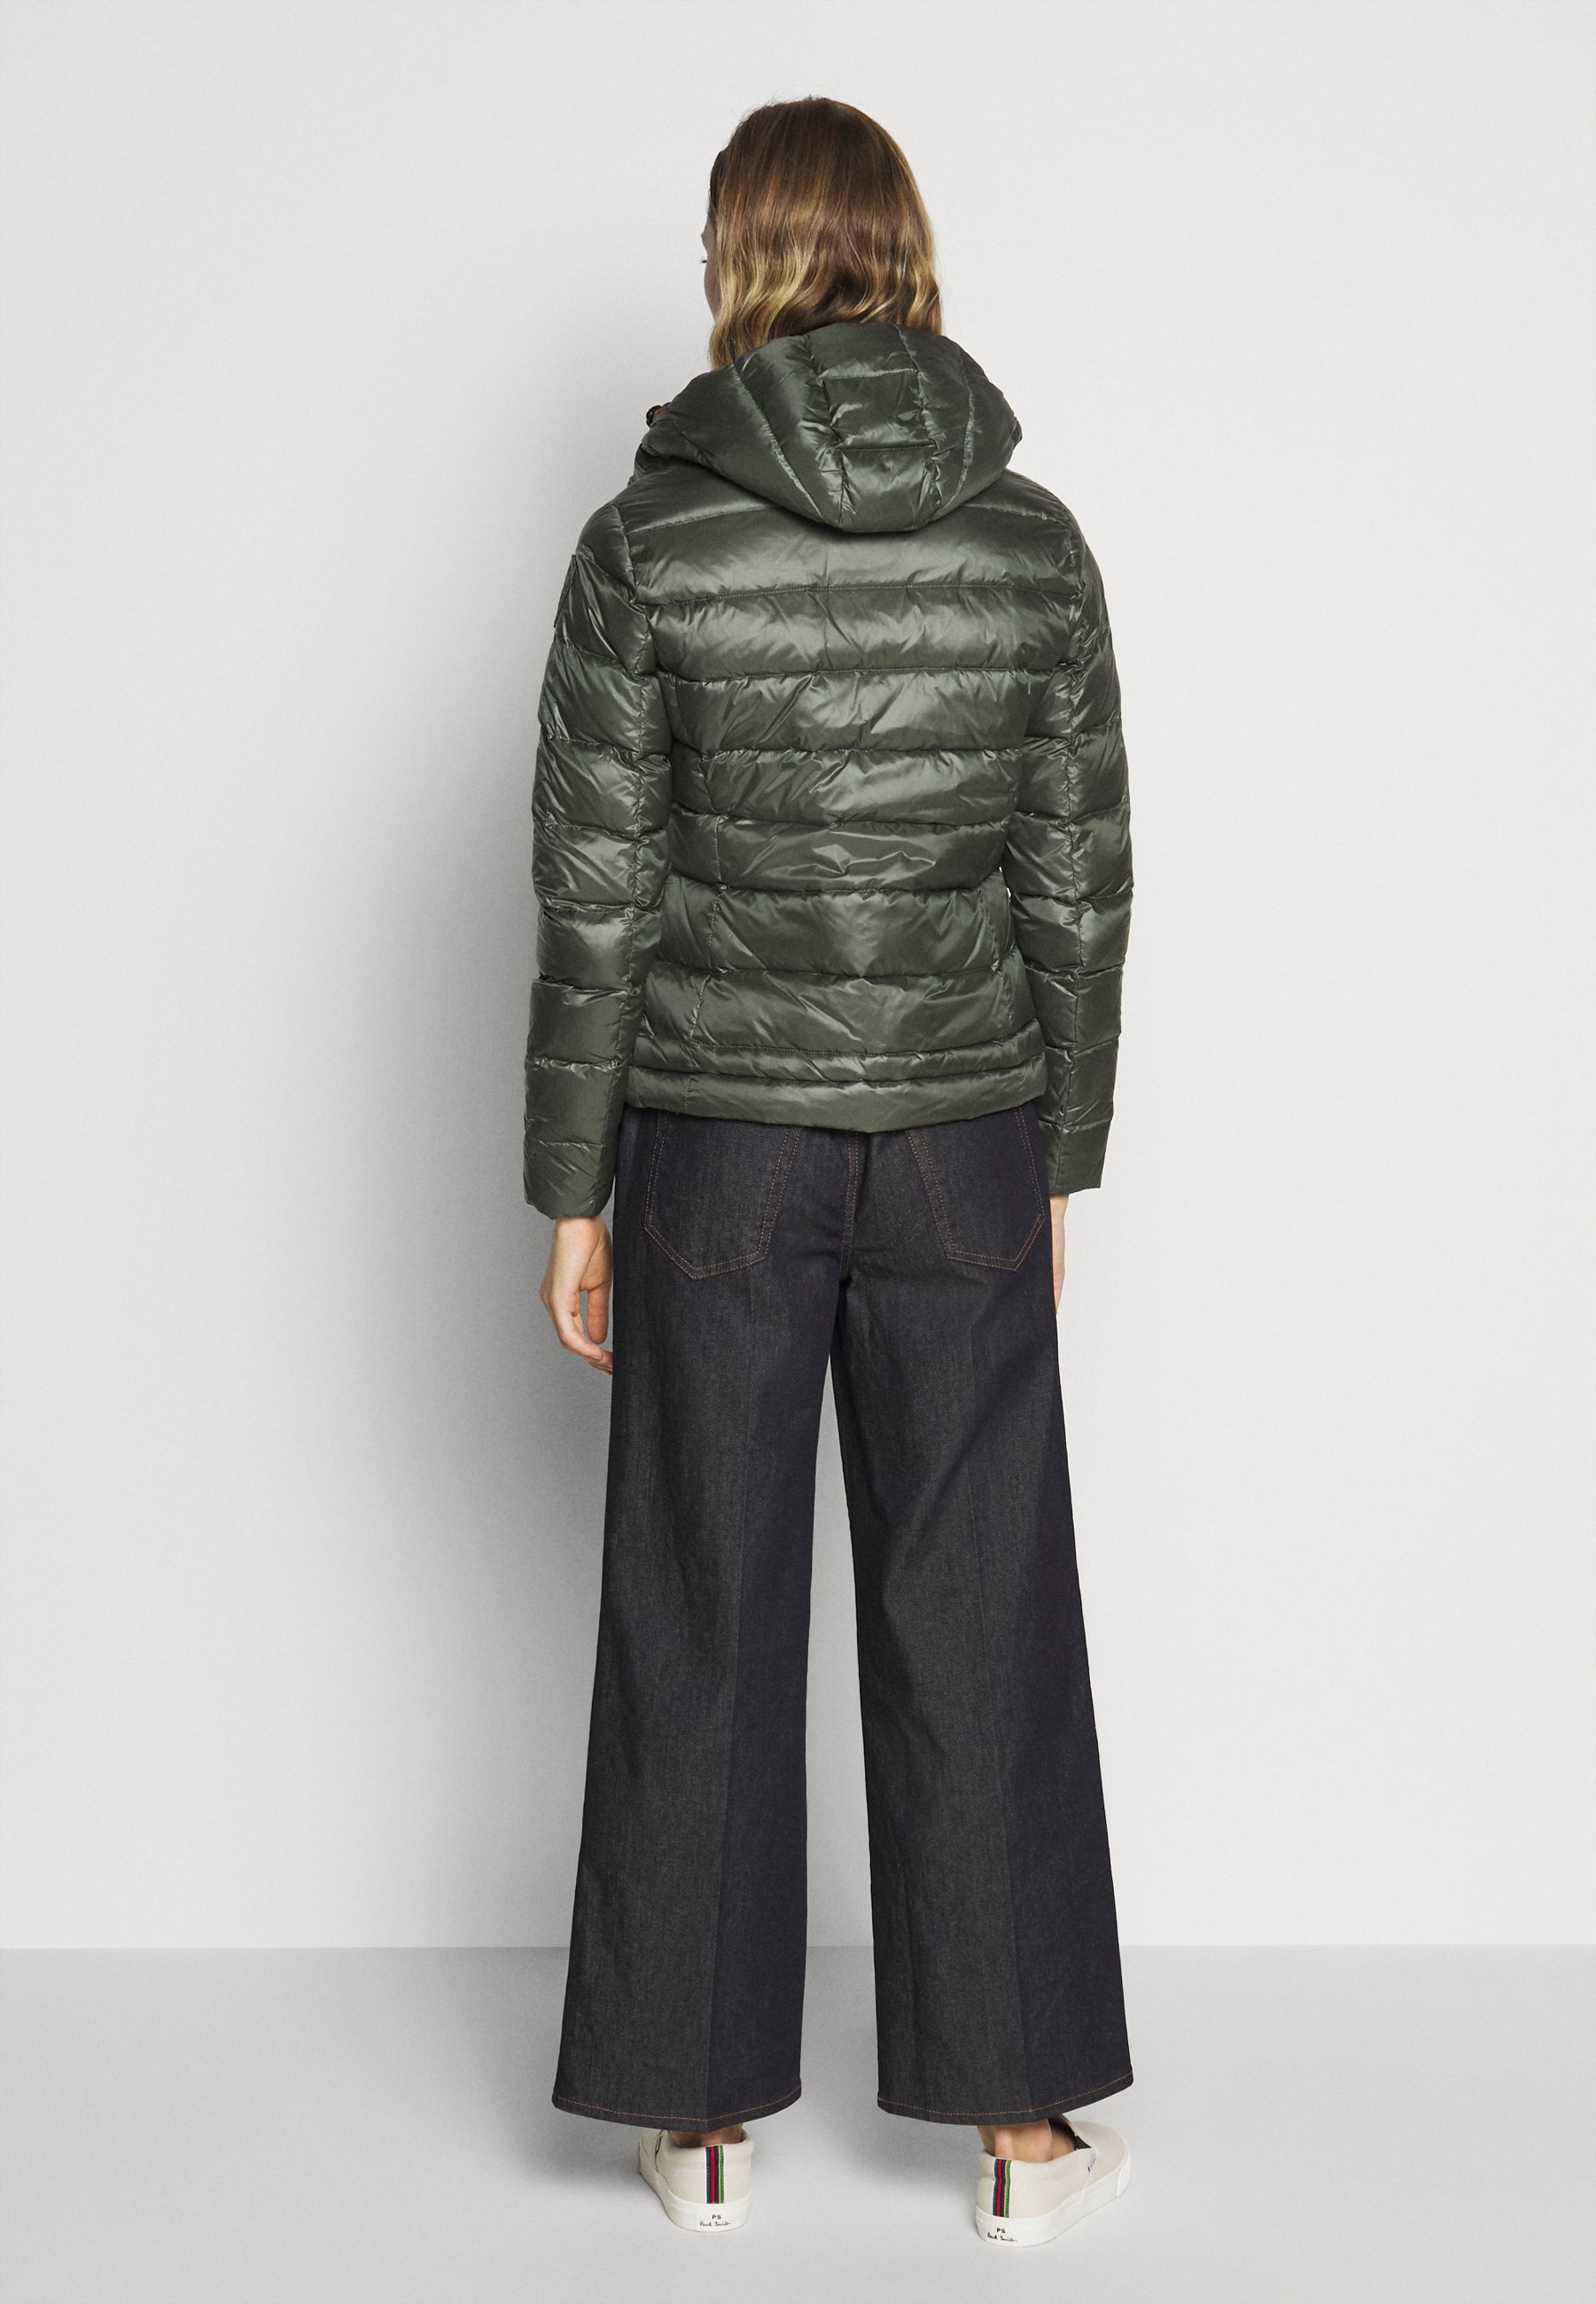 Amazing Price Women's Clothing Blauer GIUBBINI CORTI IMBOTTITO PIUMA Down jacket olive tPjc8NwYb